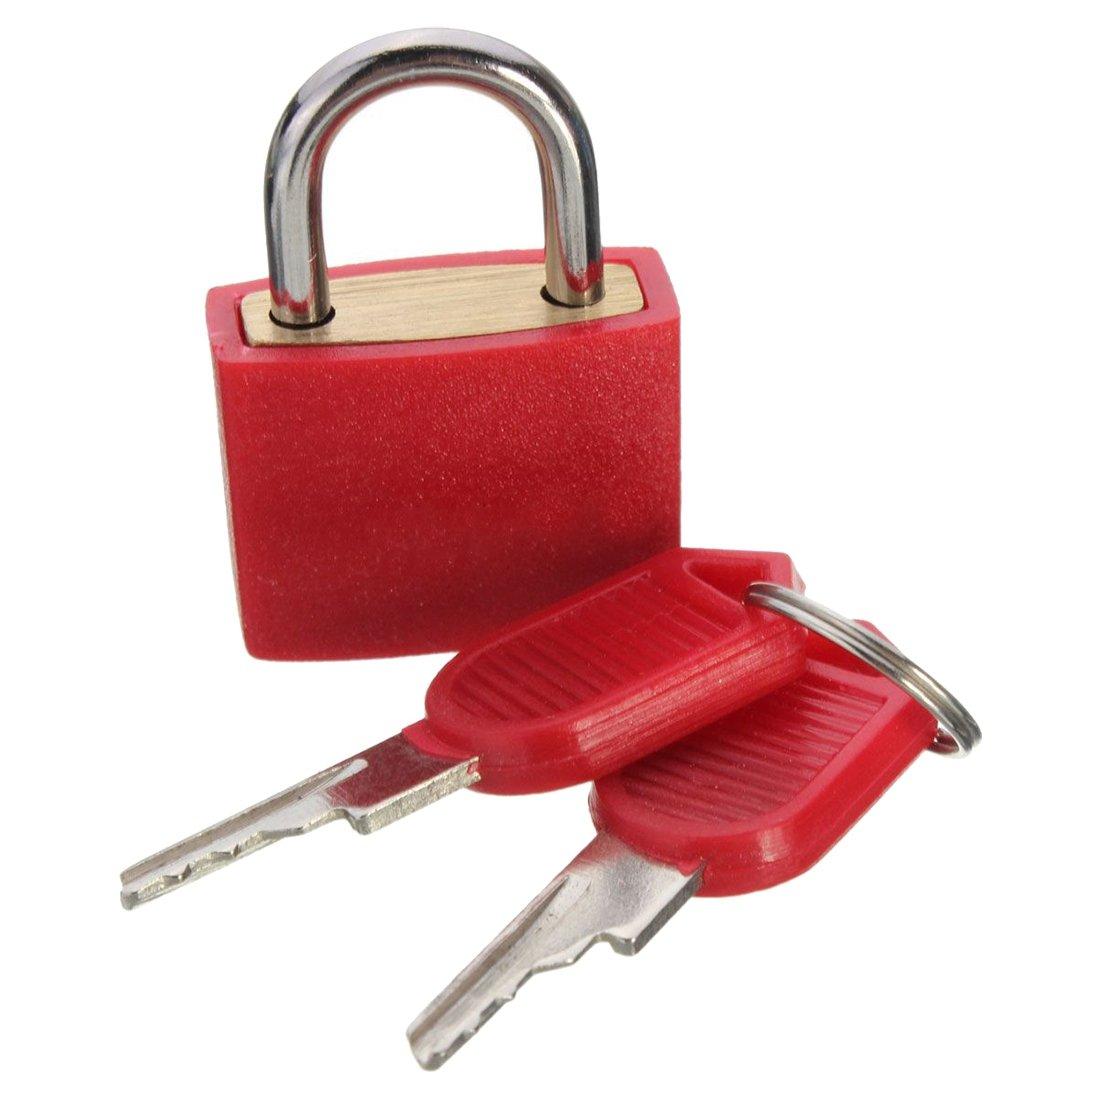 Travel Padlocks - SODIAL(R)23mm Brass Padlock Travel Luggage Padlocks Lock£¨Colour: red£